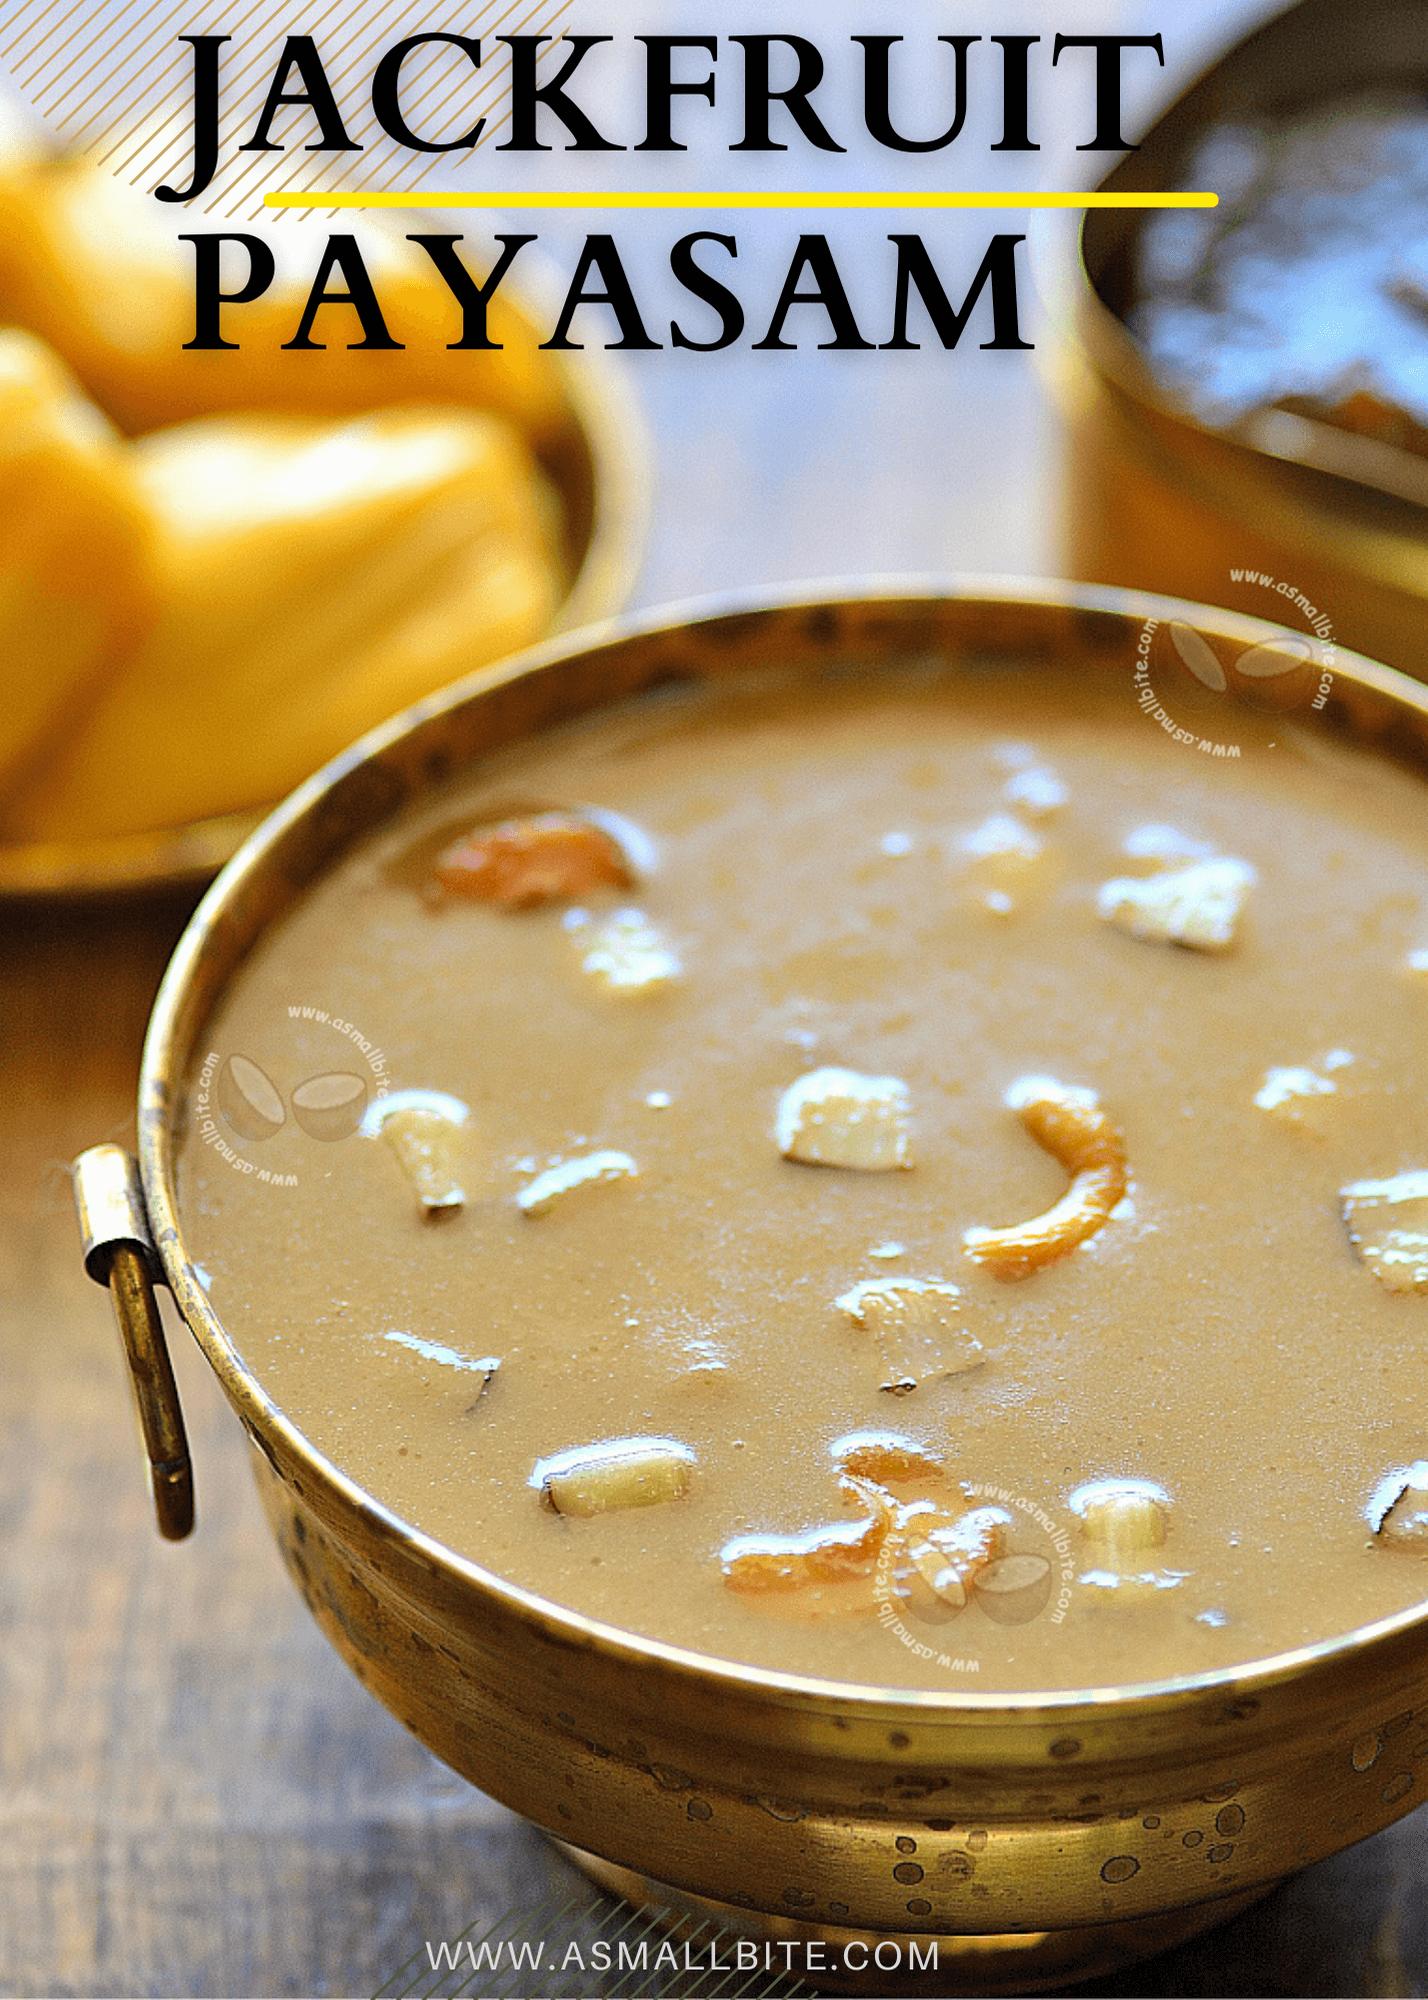 Jackfruit Payasam Recipe